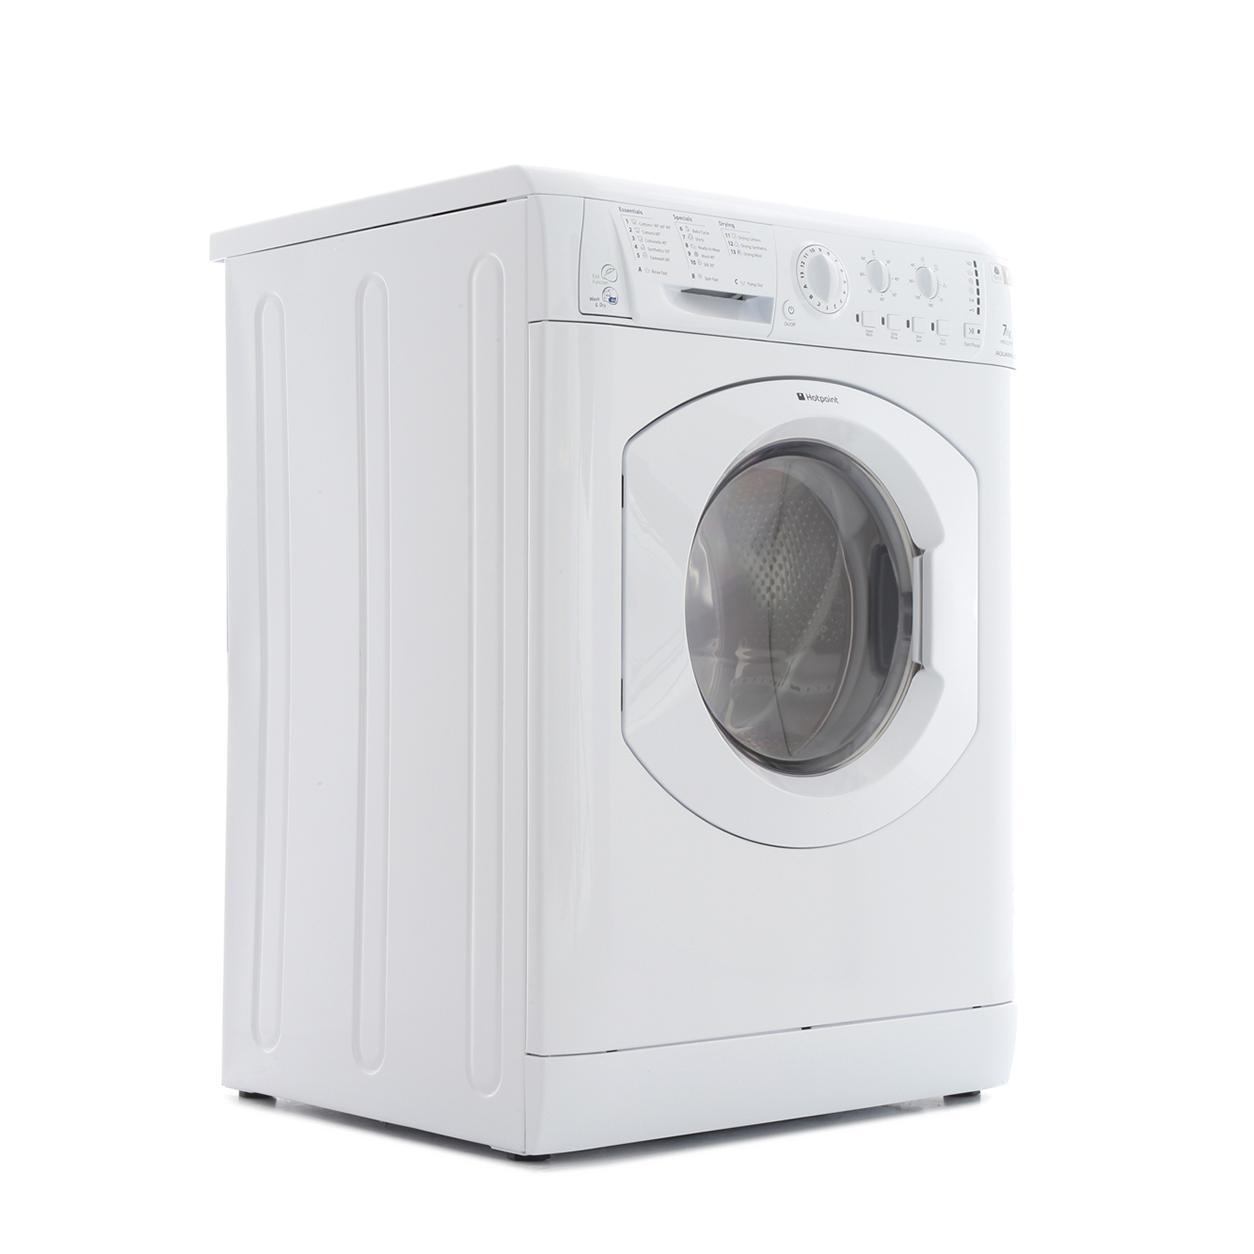 Hotpoint Aquarius WDL5290P Washer Dryer